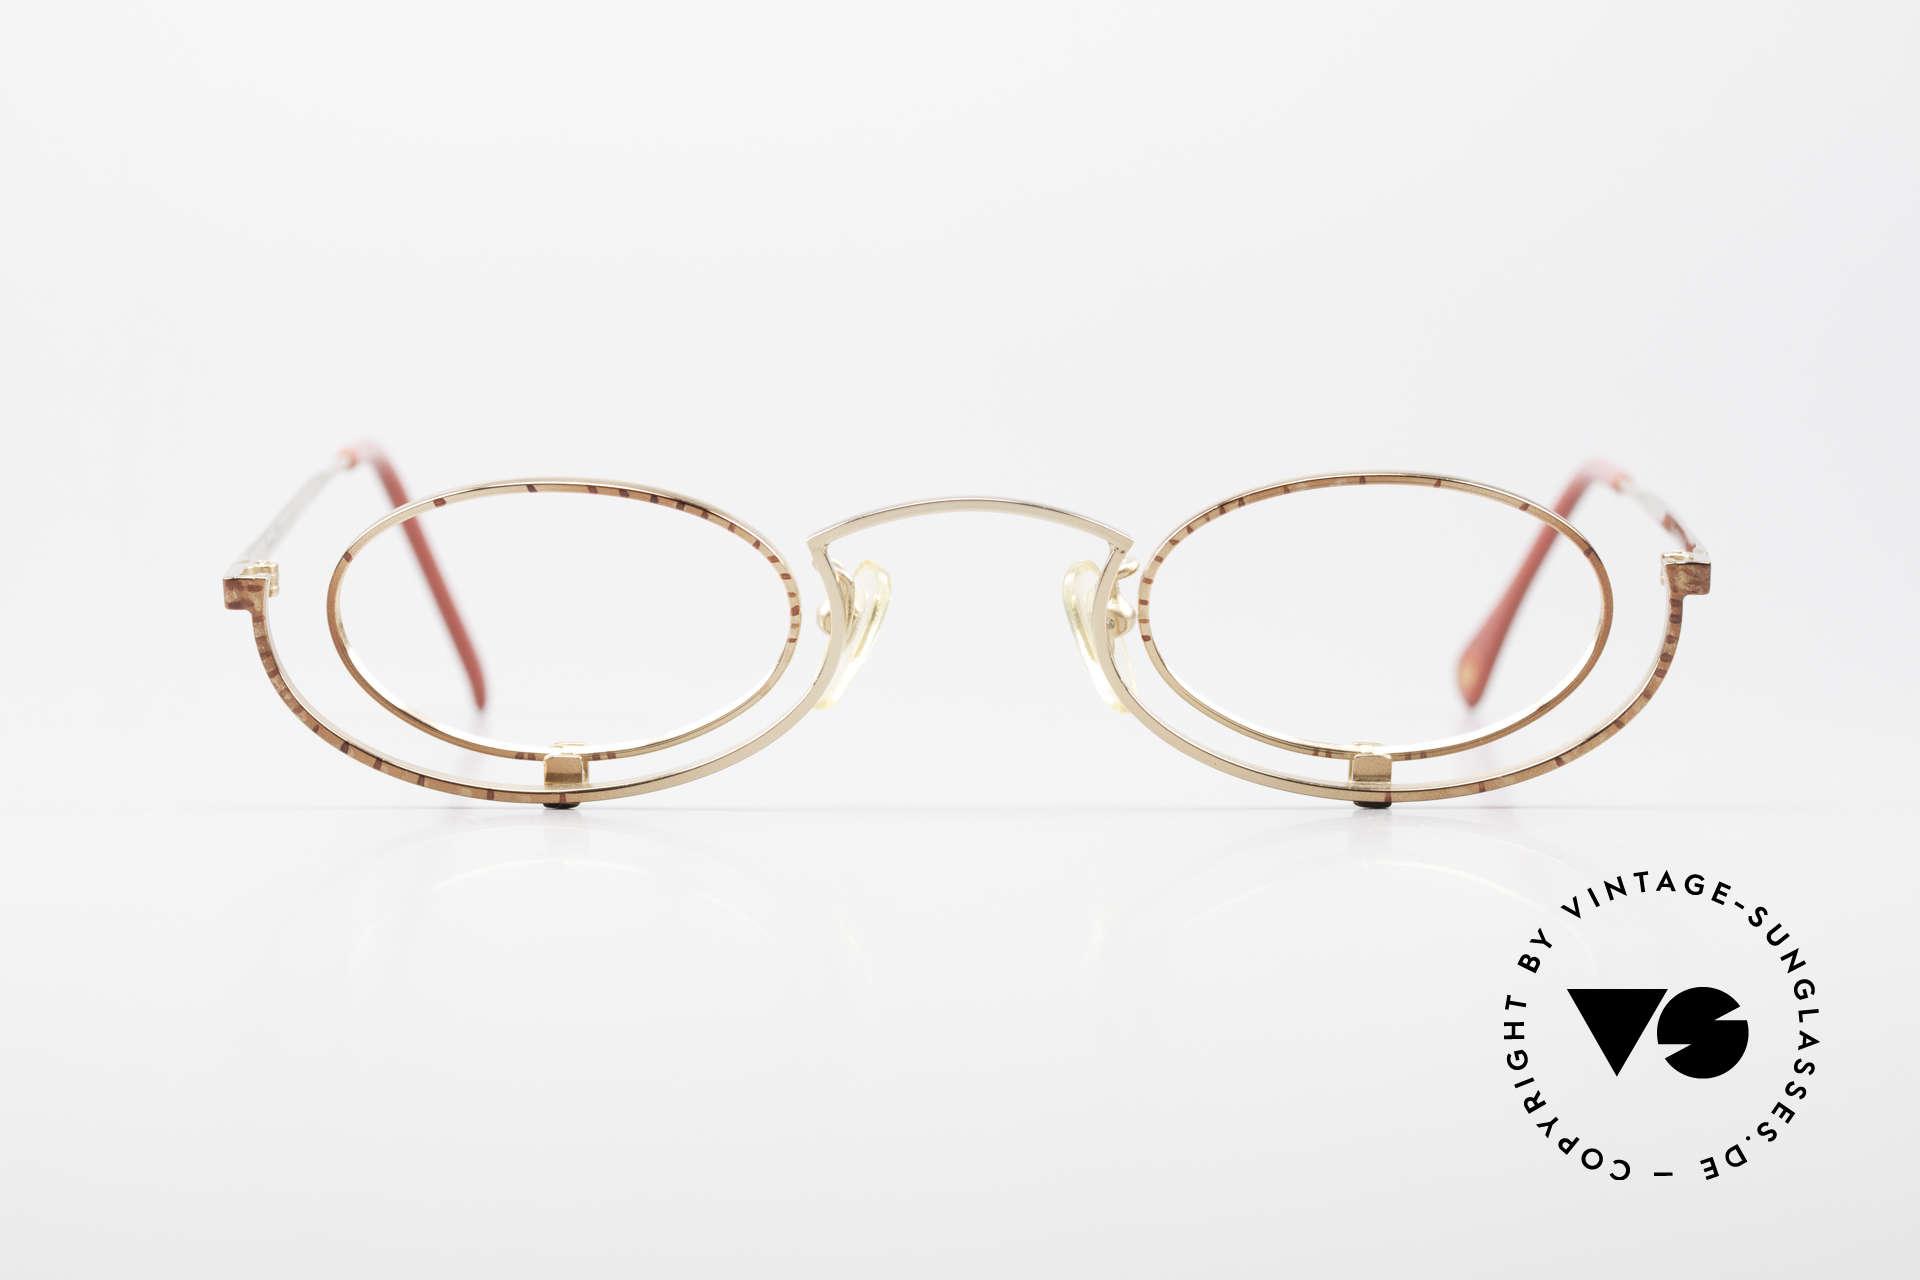 Casanova LC35 Crazy Designer Reading Glasses, design: full of verve and something really different!, Made for Women